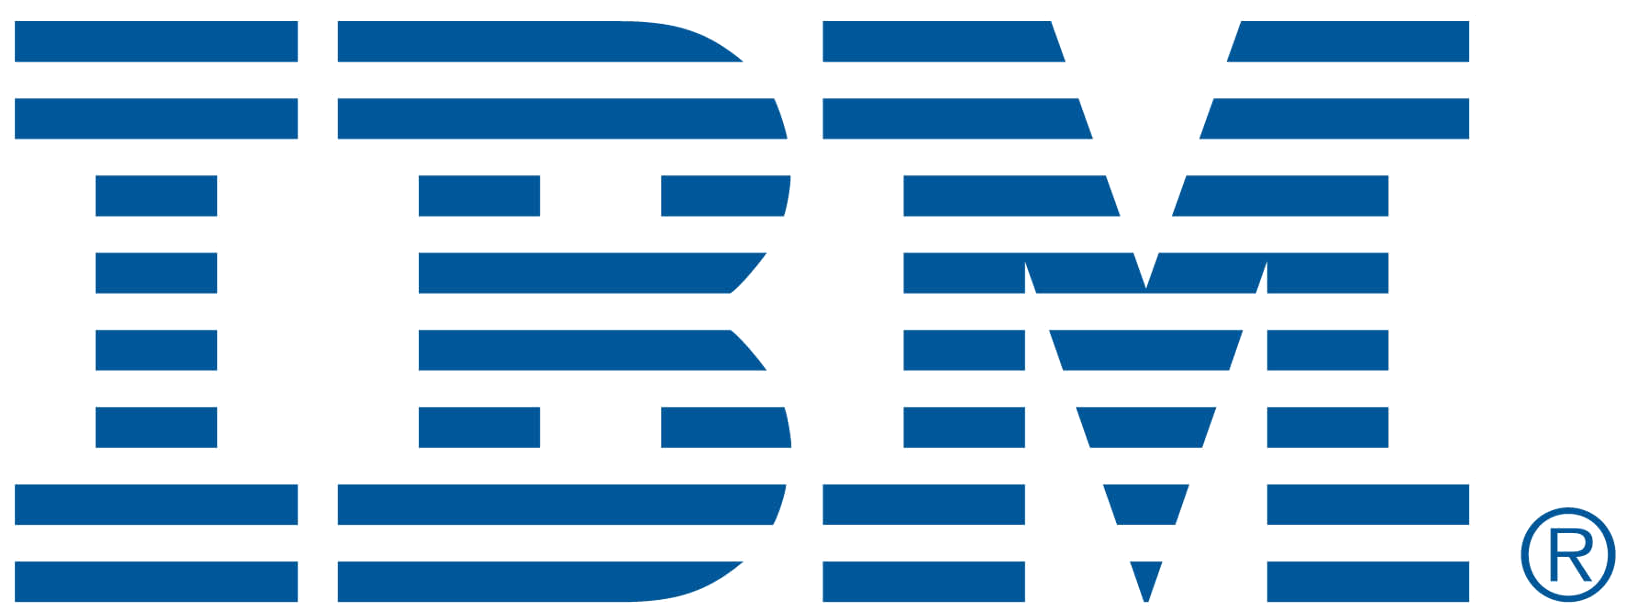 IBM Talent Management